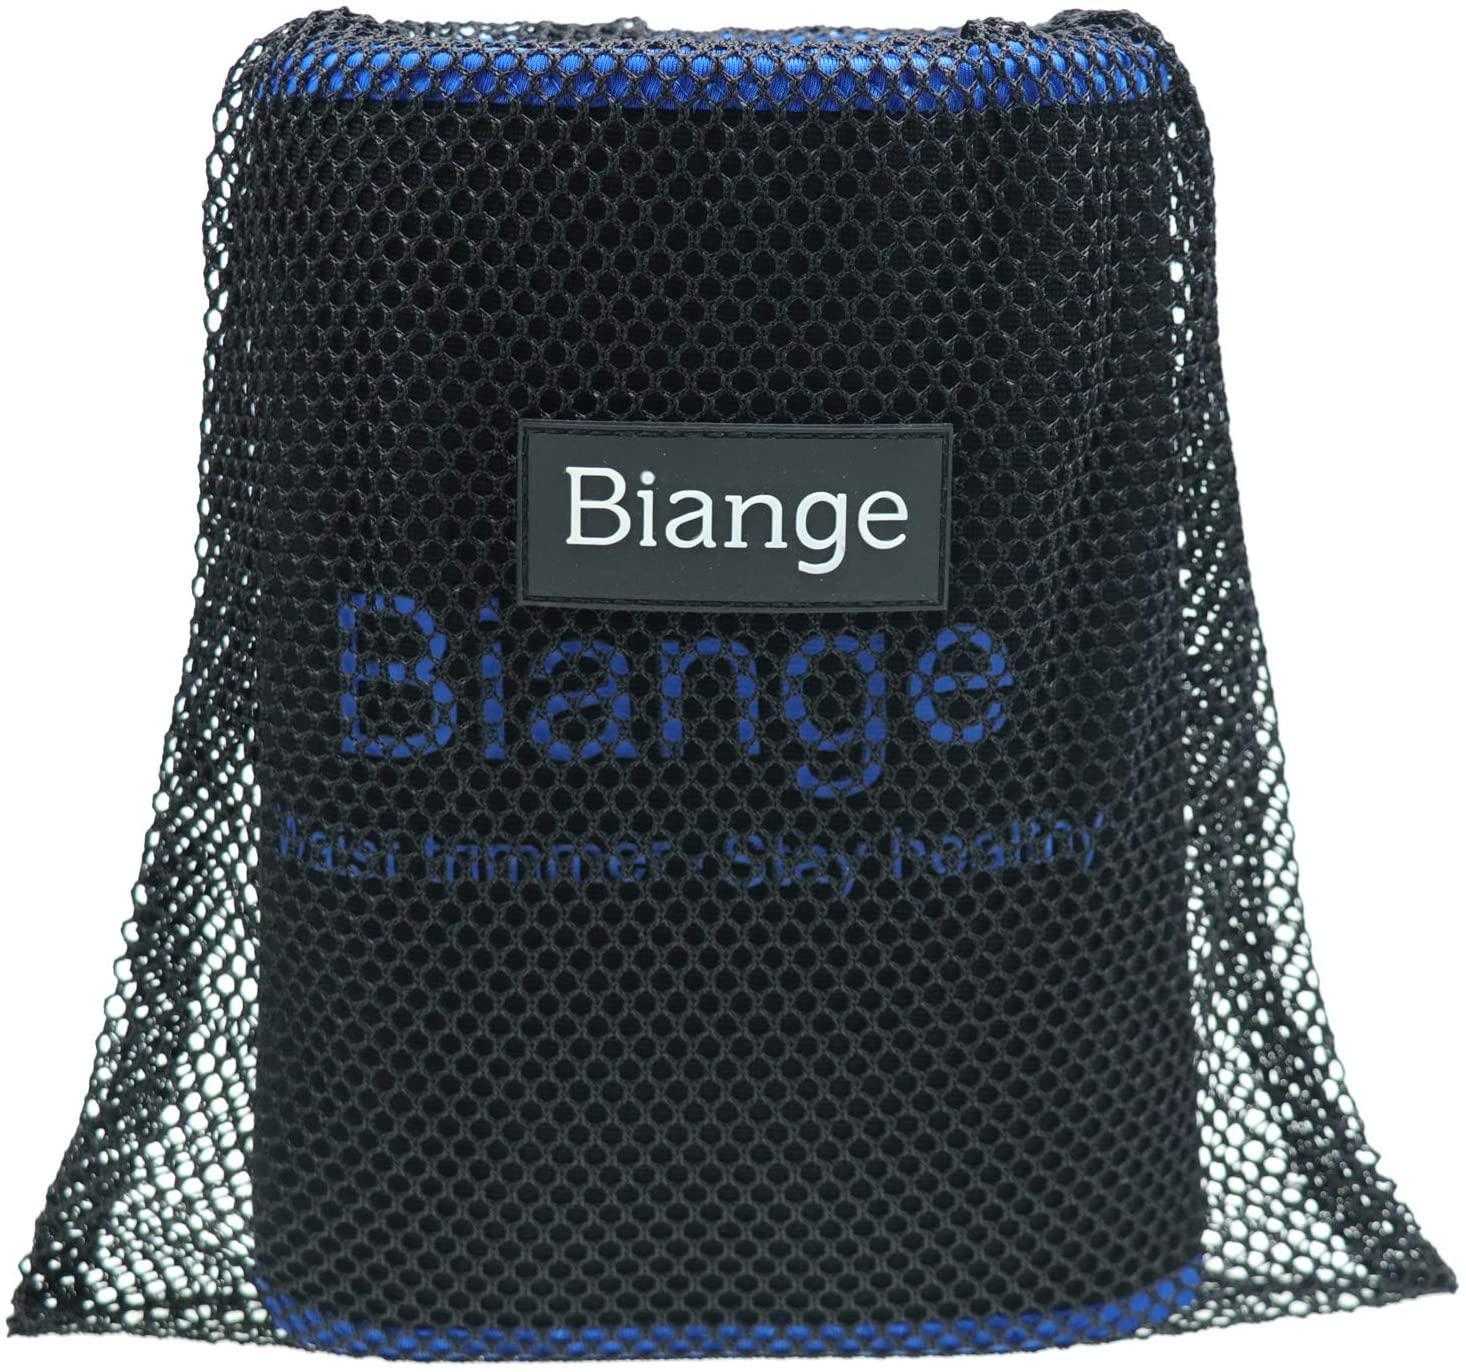 سعر حزام الساونا الحراري للبطن Biange